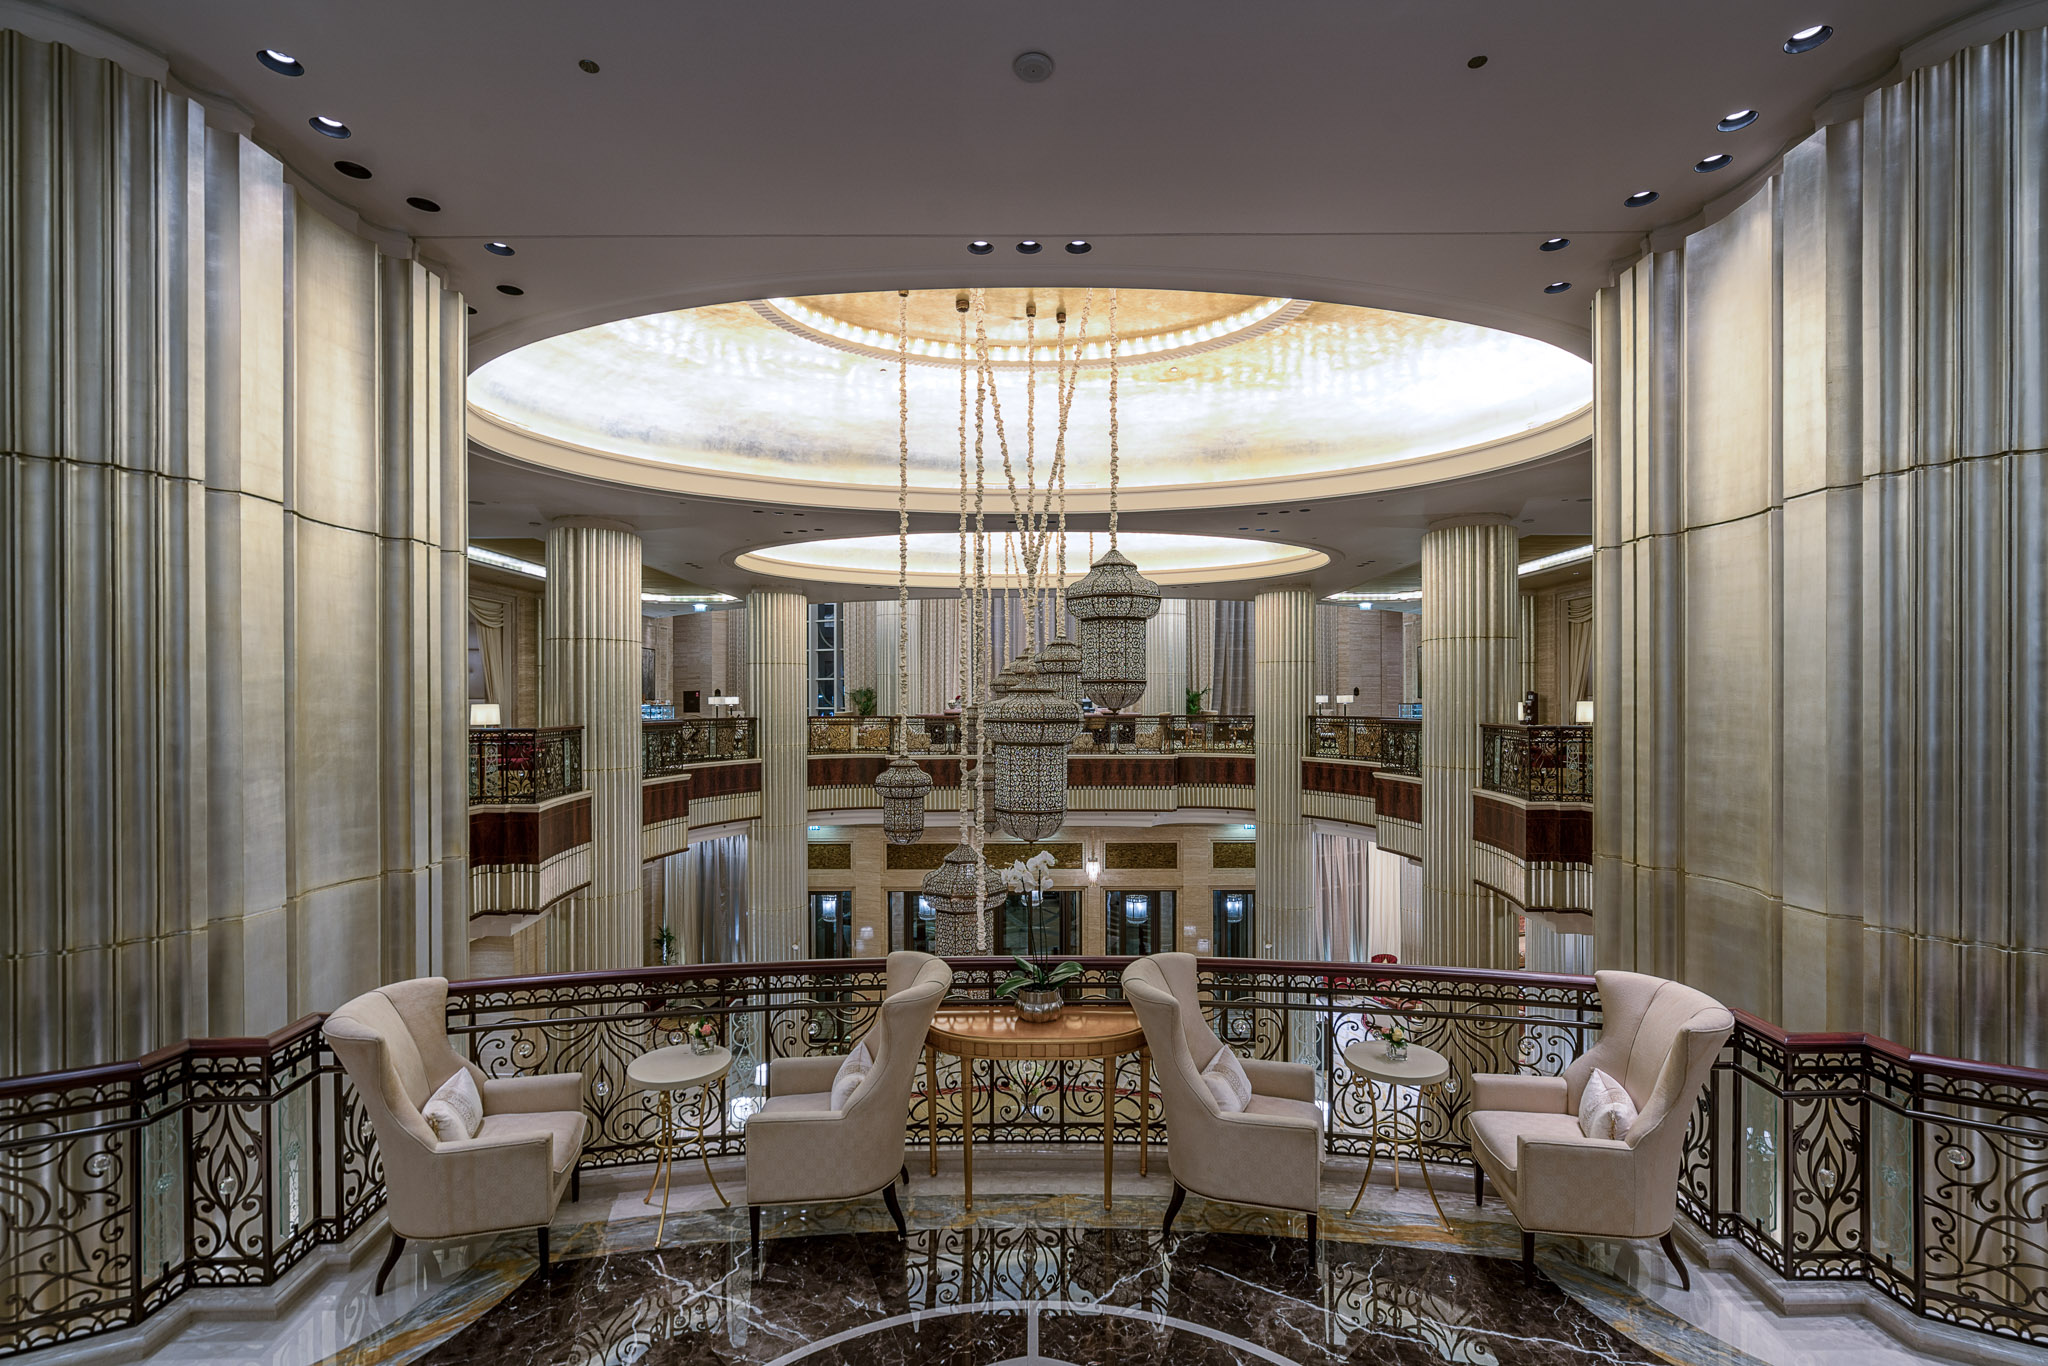 Foyer Decor Abu Dhabi : St regis abu dhabi review andy s travel